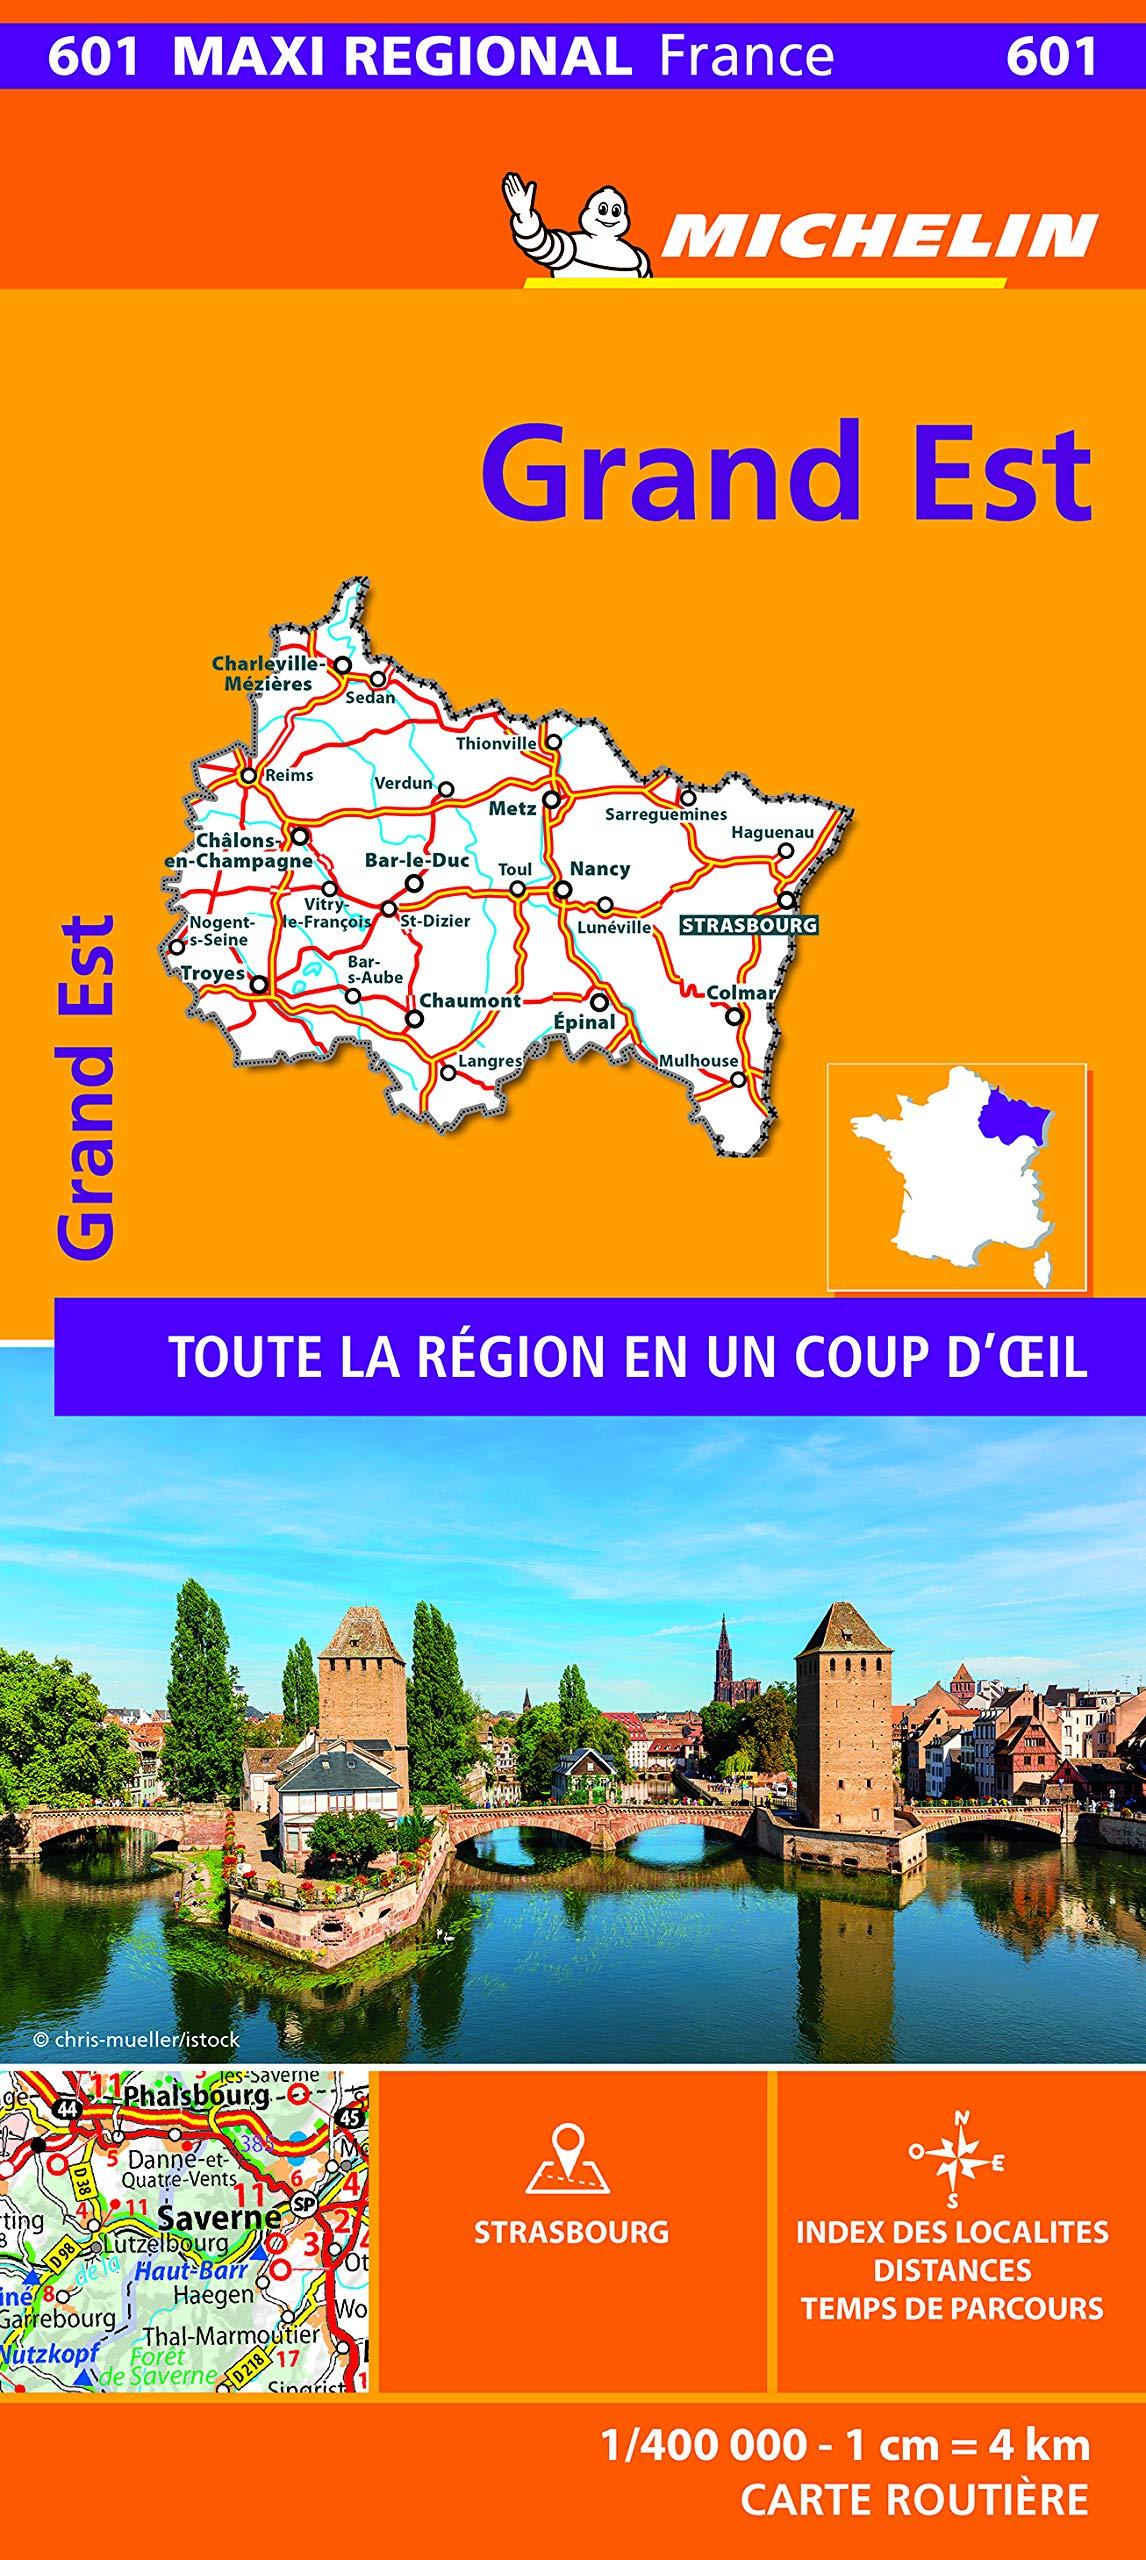 Regions Grand Est Cartes 7640 French Edition 9782067242531 Amazon Com Books